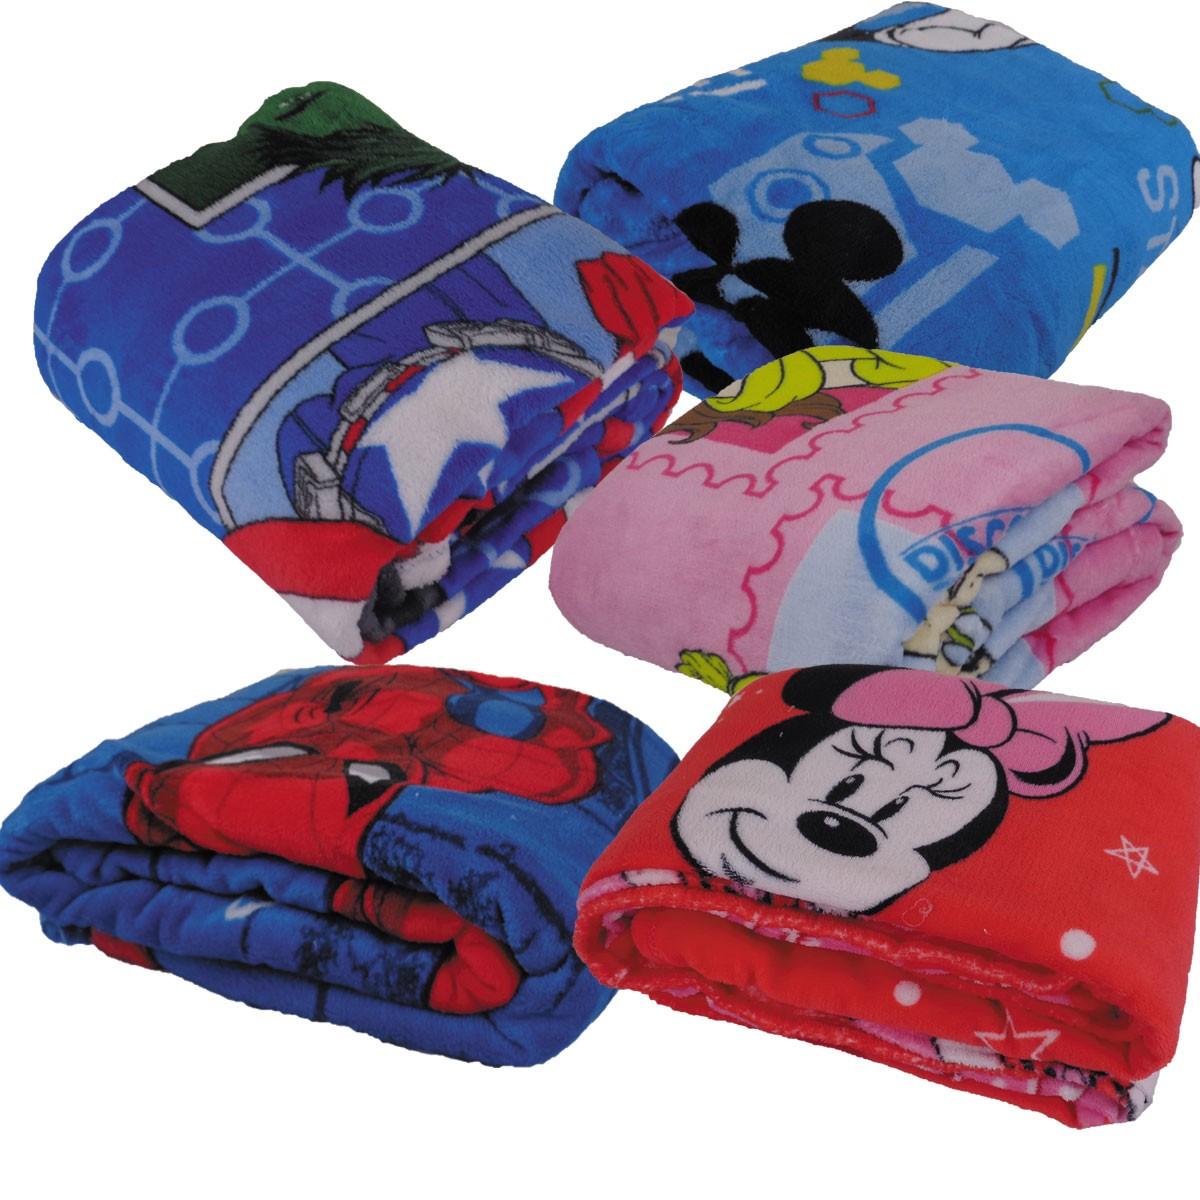 Cobertor Infantil Juvenil Manta Fleece Microfibra Soft Jolitex